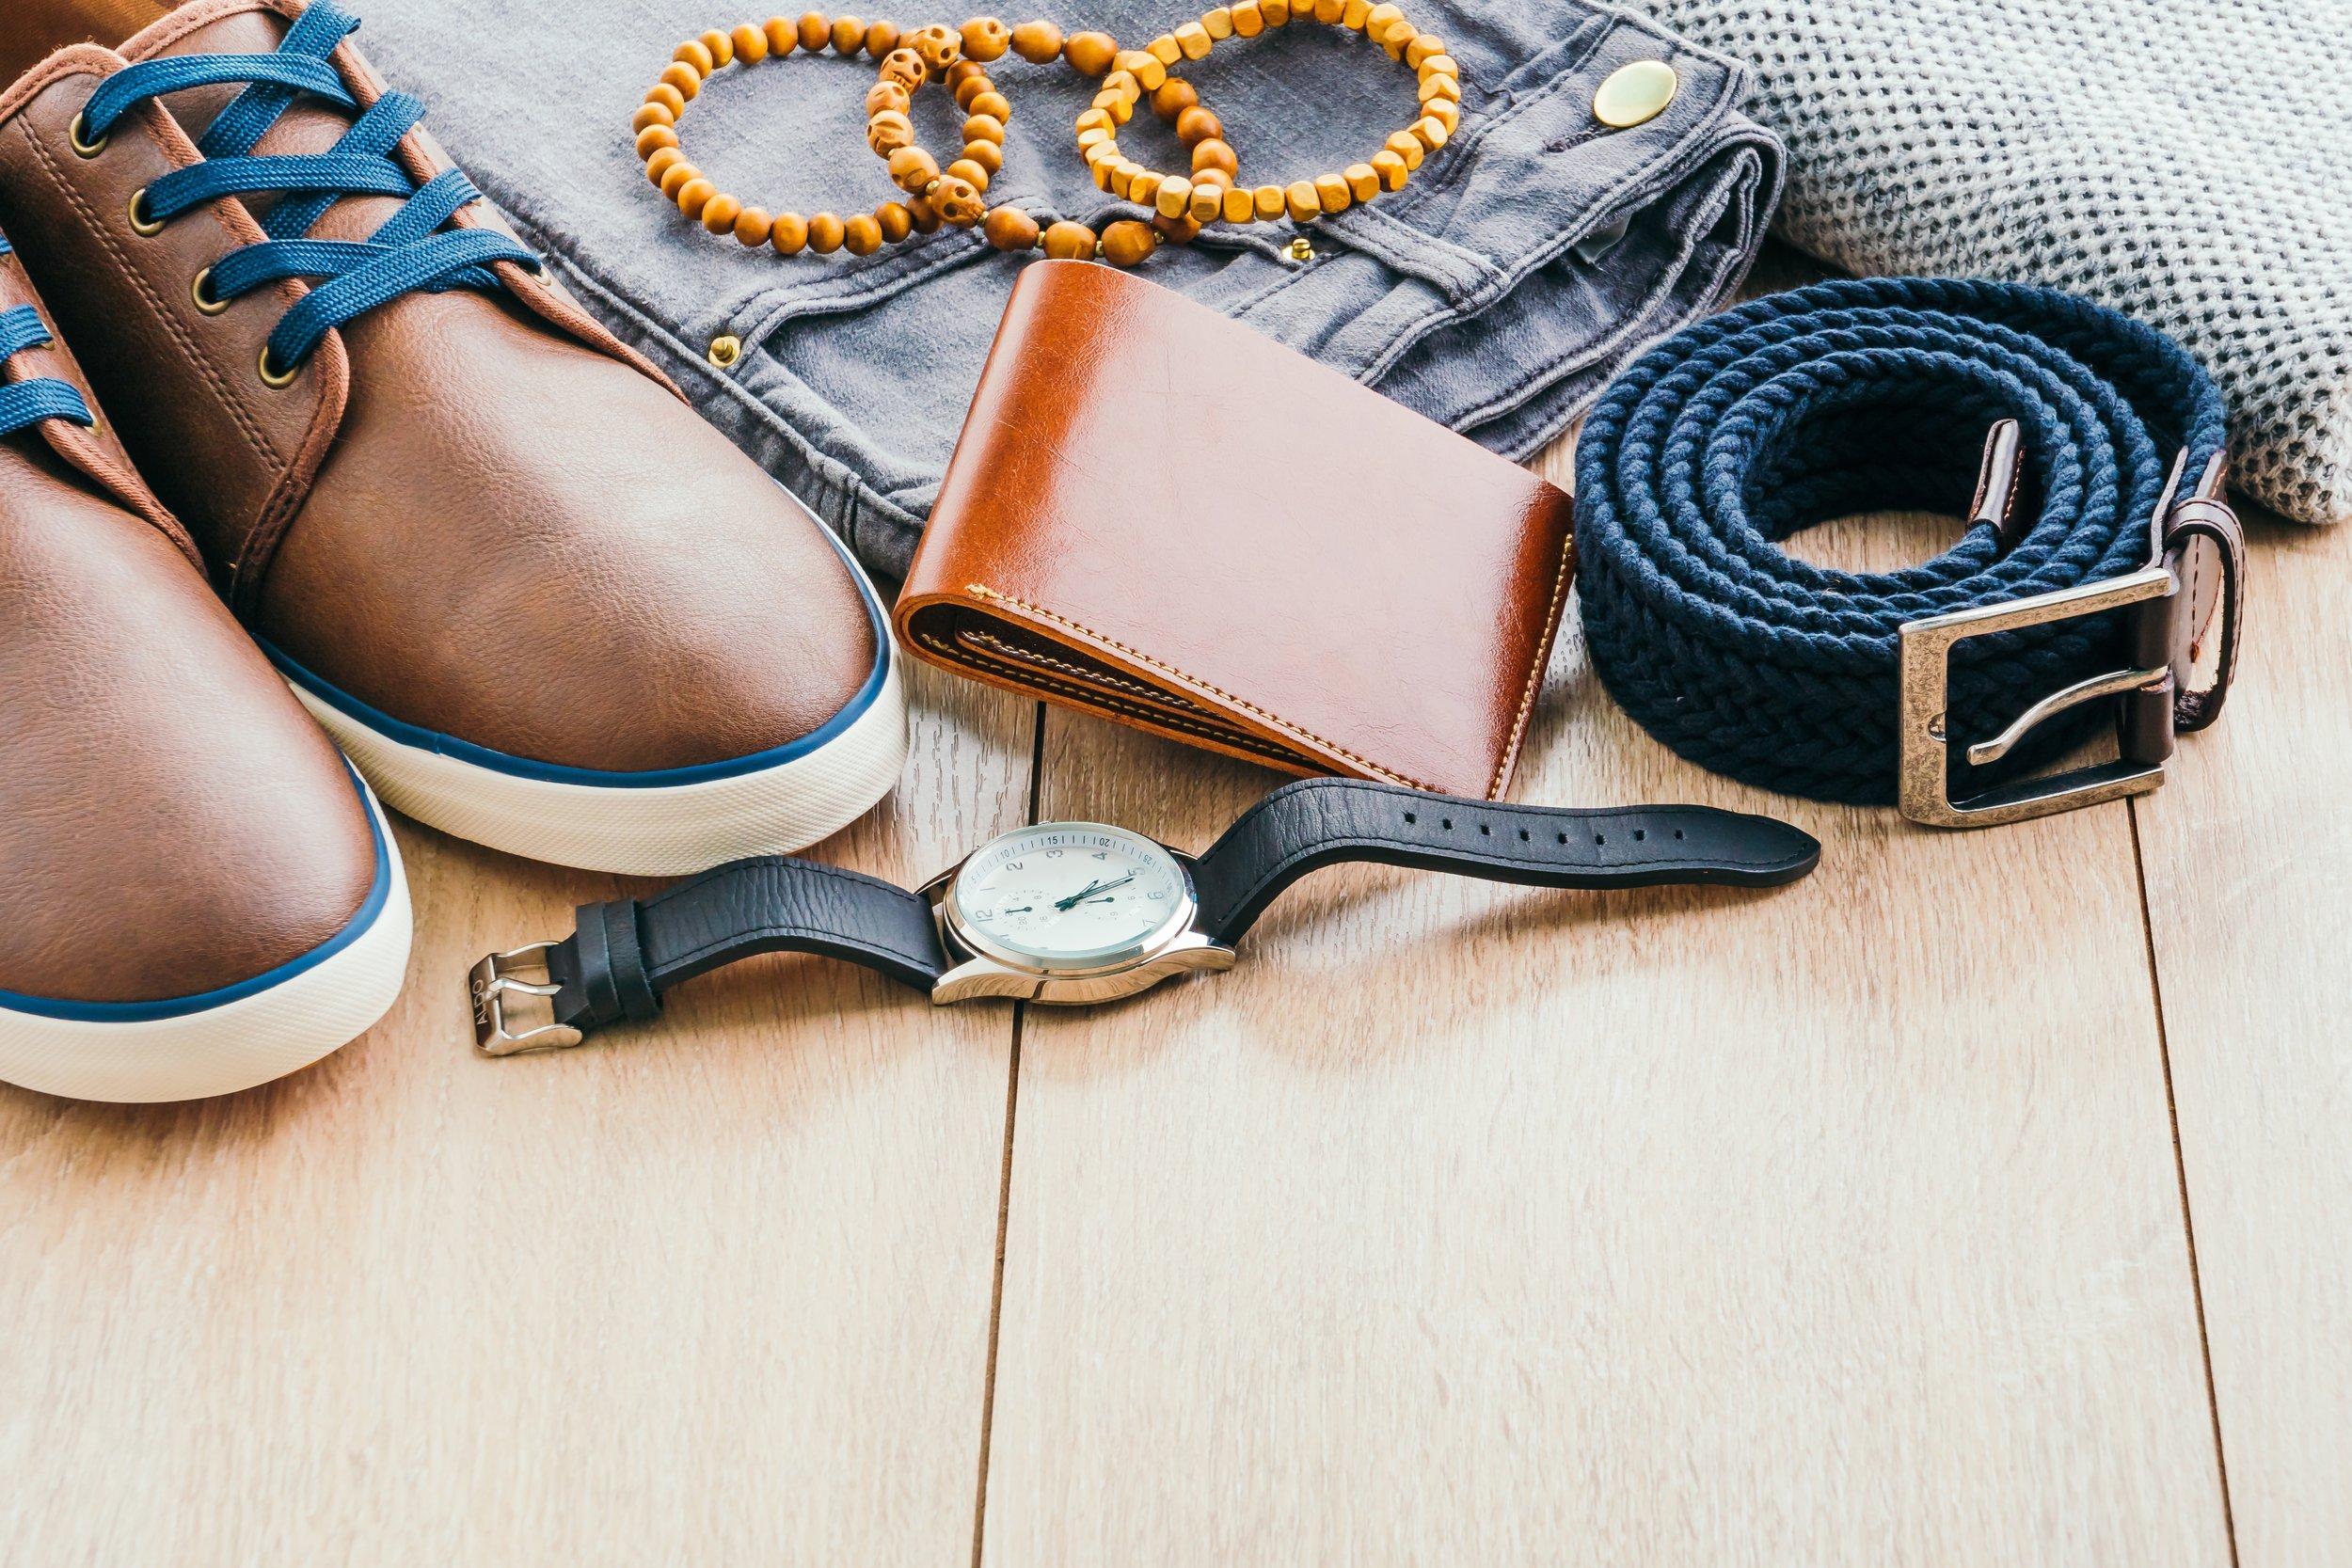 Fashionable accessories at Supernova Zadar